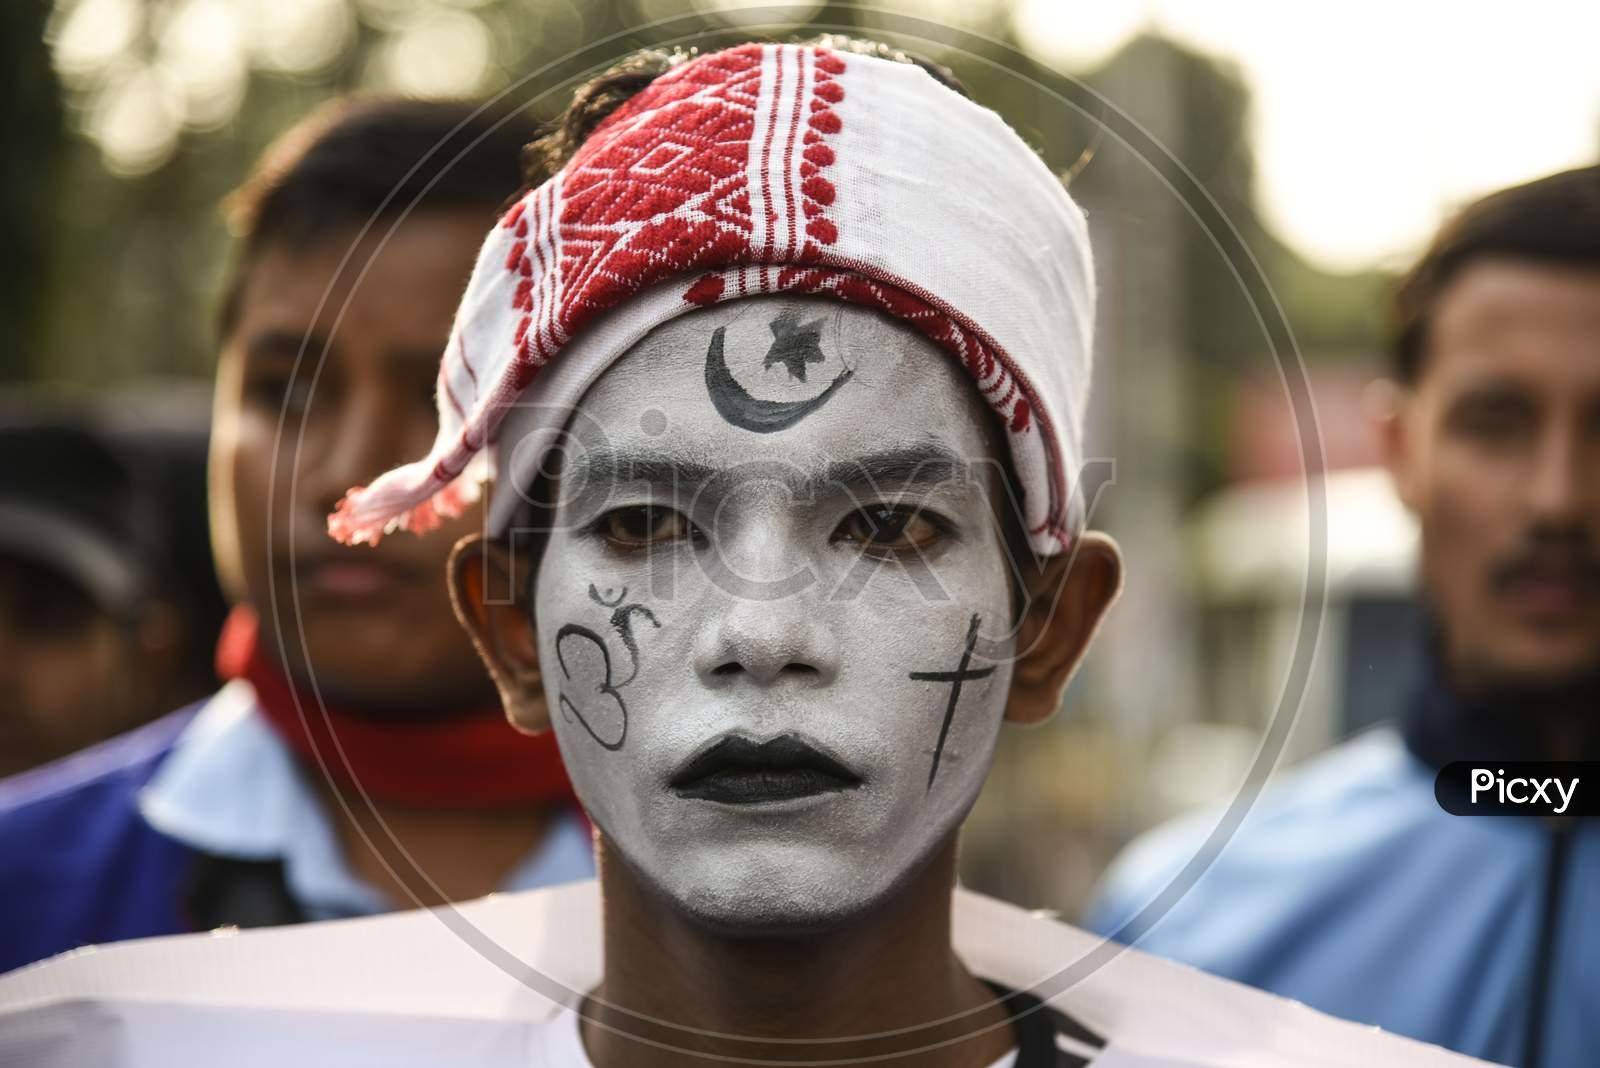 A Protester In An Getup Against Caa And Cab Amendment Bill In Guwahati, Assam